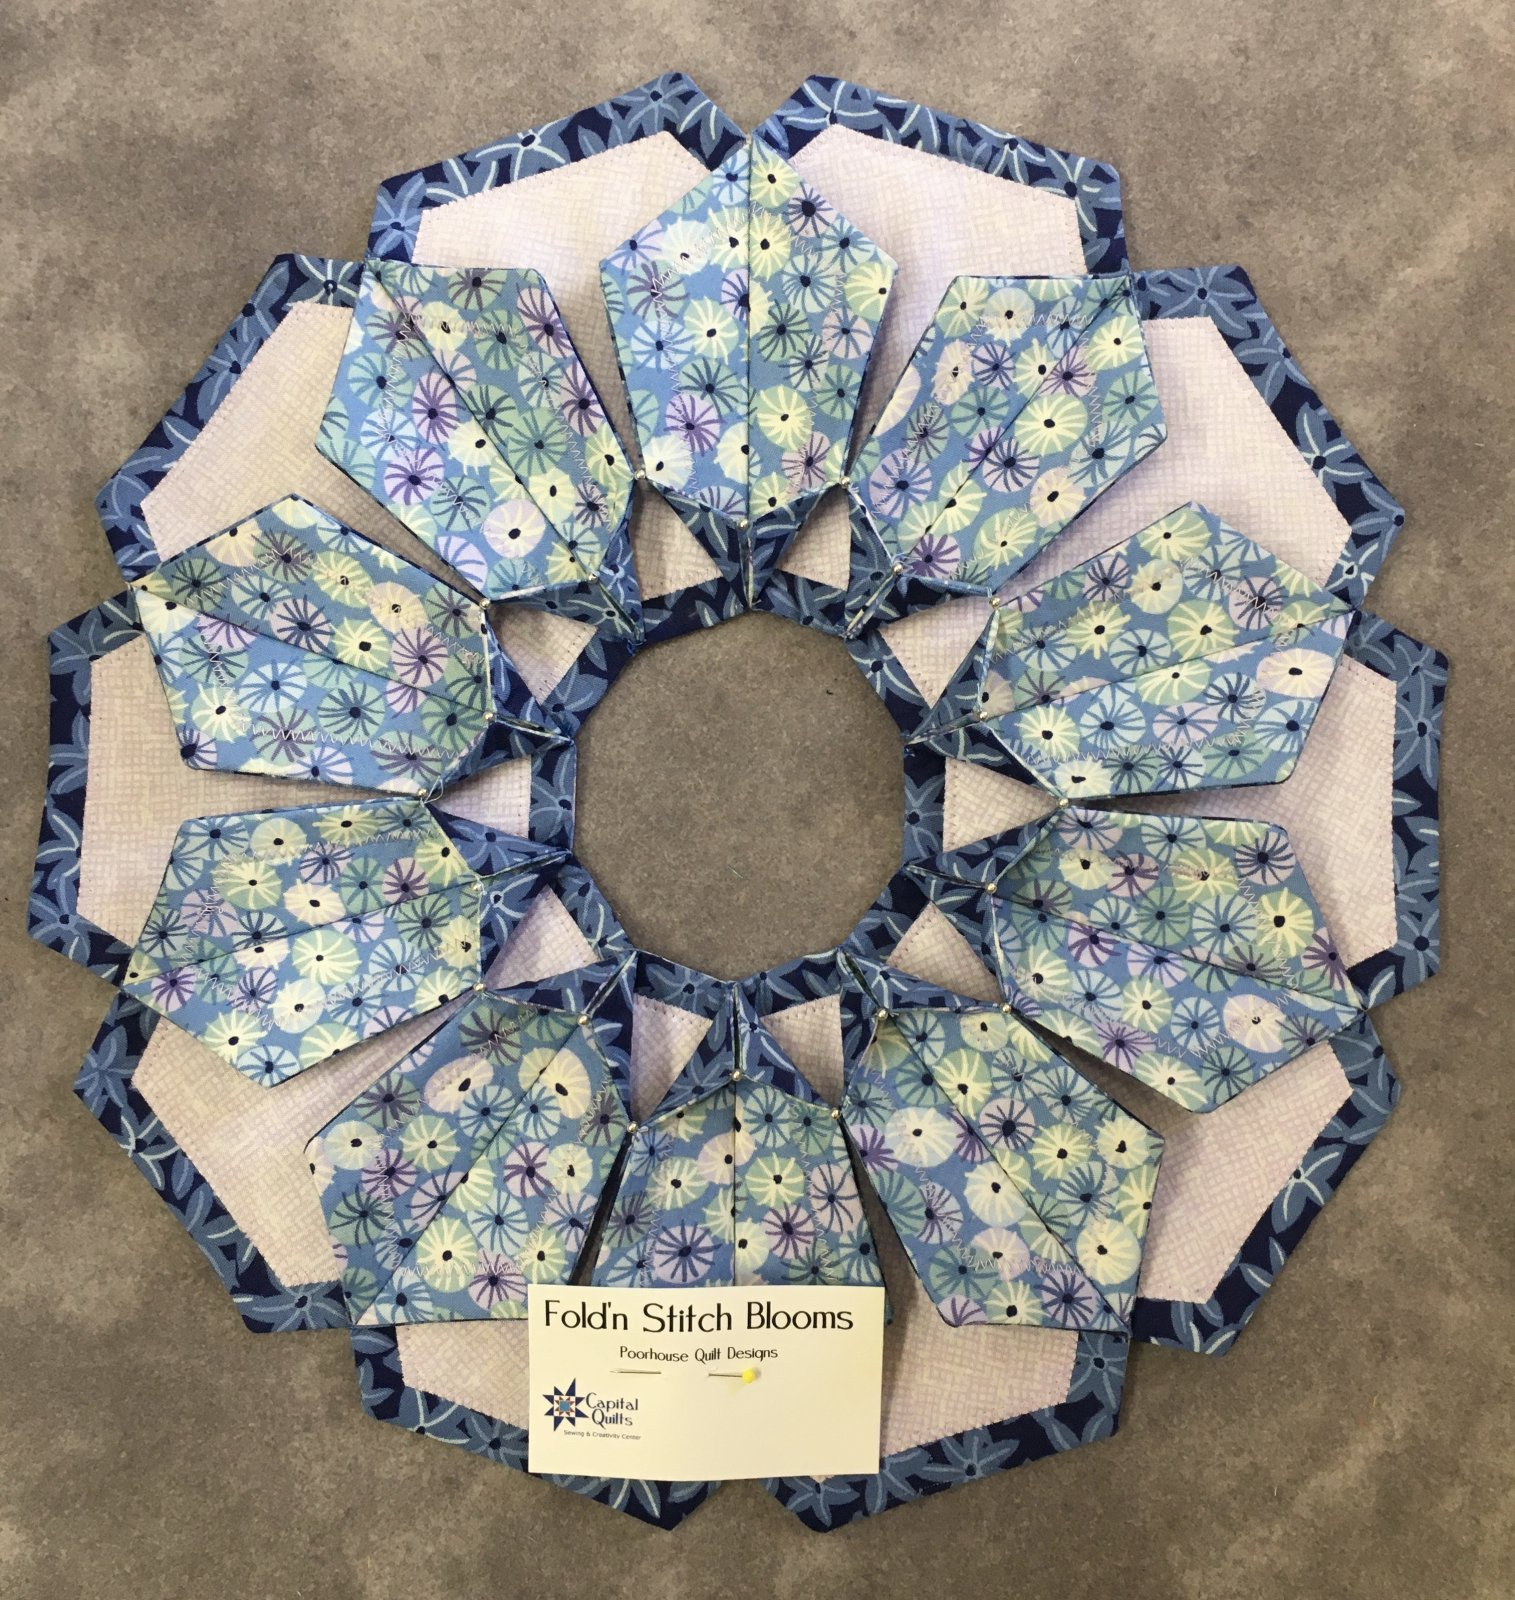 MODEL- Blue & Lavender Fold 'n Stitch Blooms Wreath